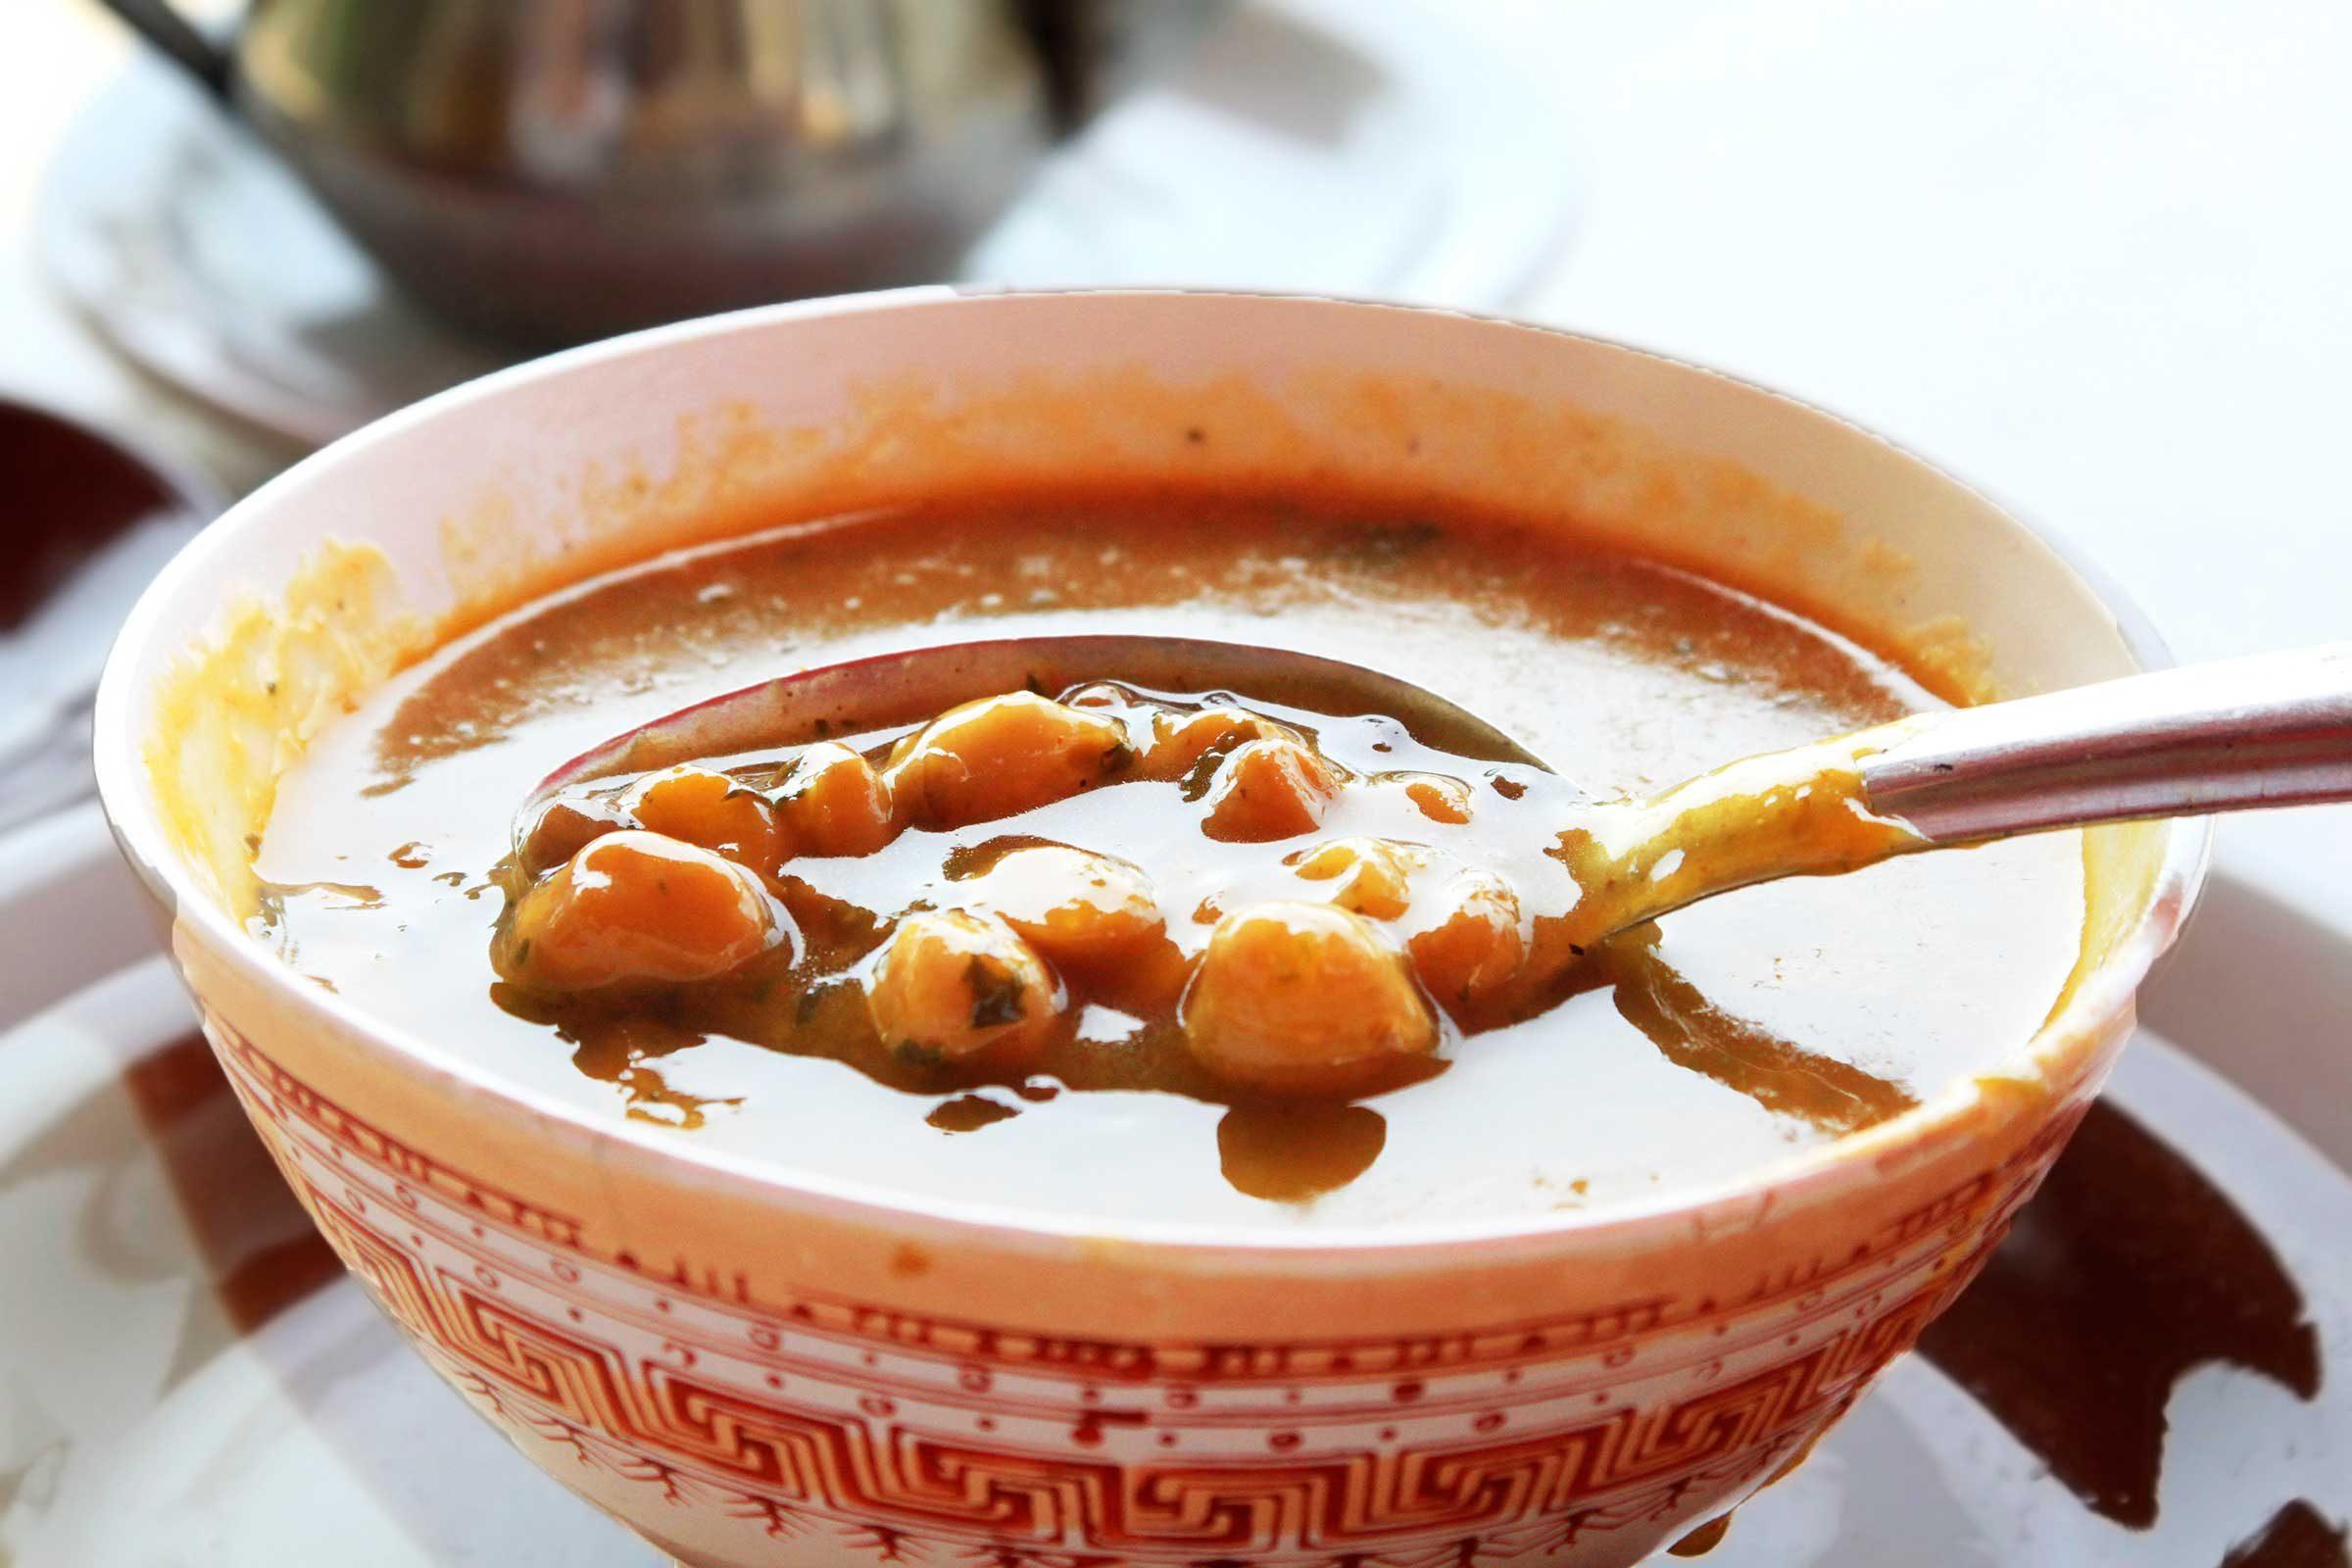 meilleures-repas-malade-mal-tete-soupe-lentilles